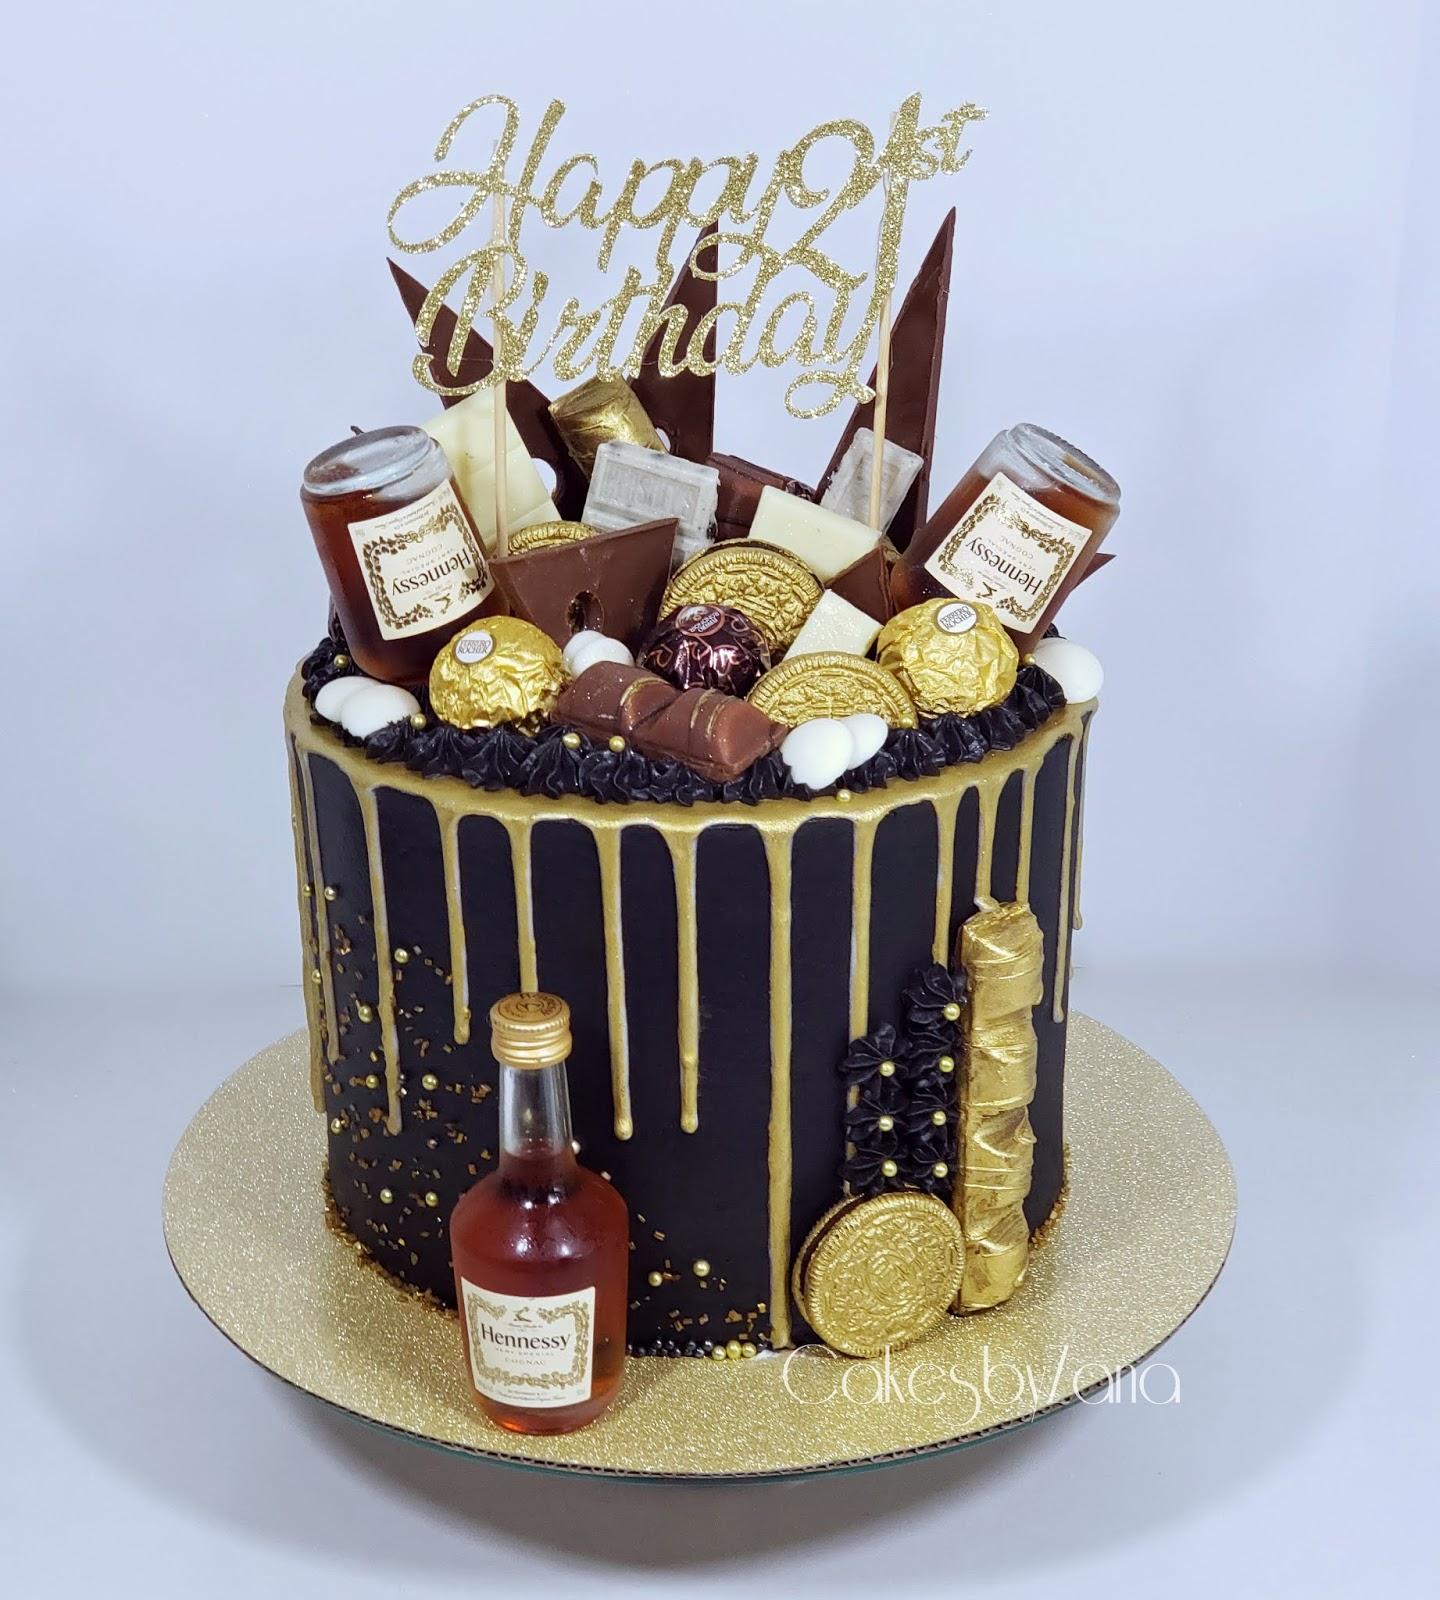 Excellent Cakesbyzana 21St Birthday Drip Cake Funny Birthday Cards Online Alyptdamsfinfo